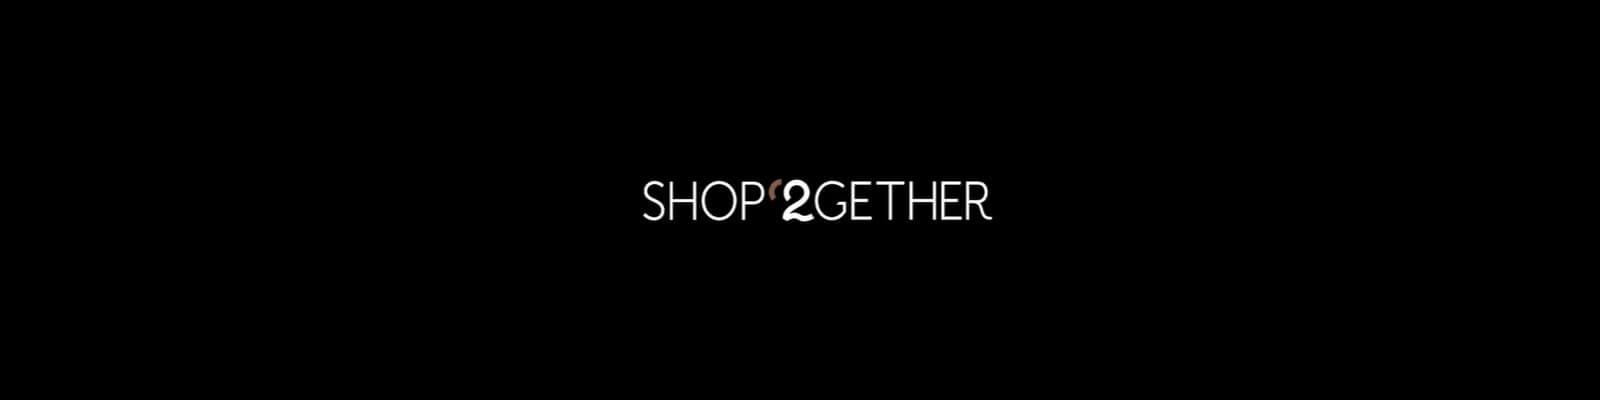 "Shop2gether é confiável e segura?<span class=""wtr-time-wrap after-title""><span class=""wtr-time-number"">7</span> minutos de leitura</span>"